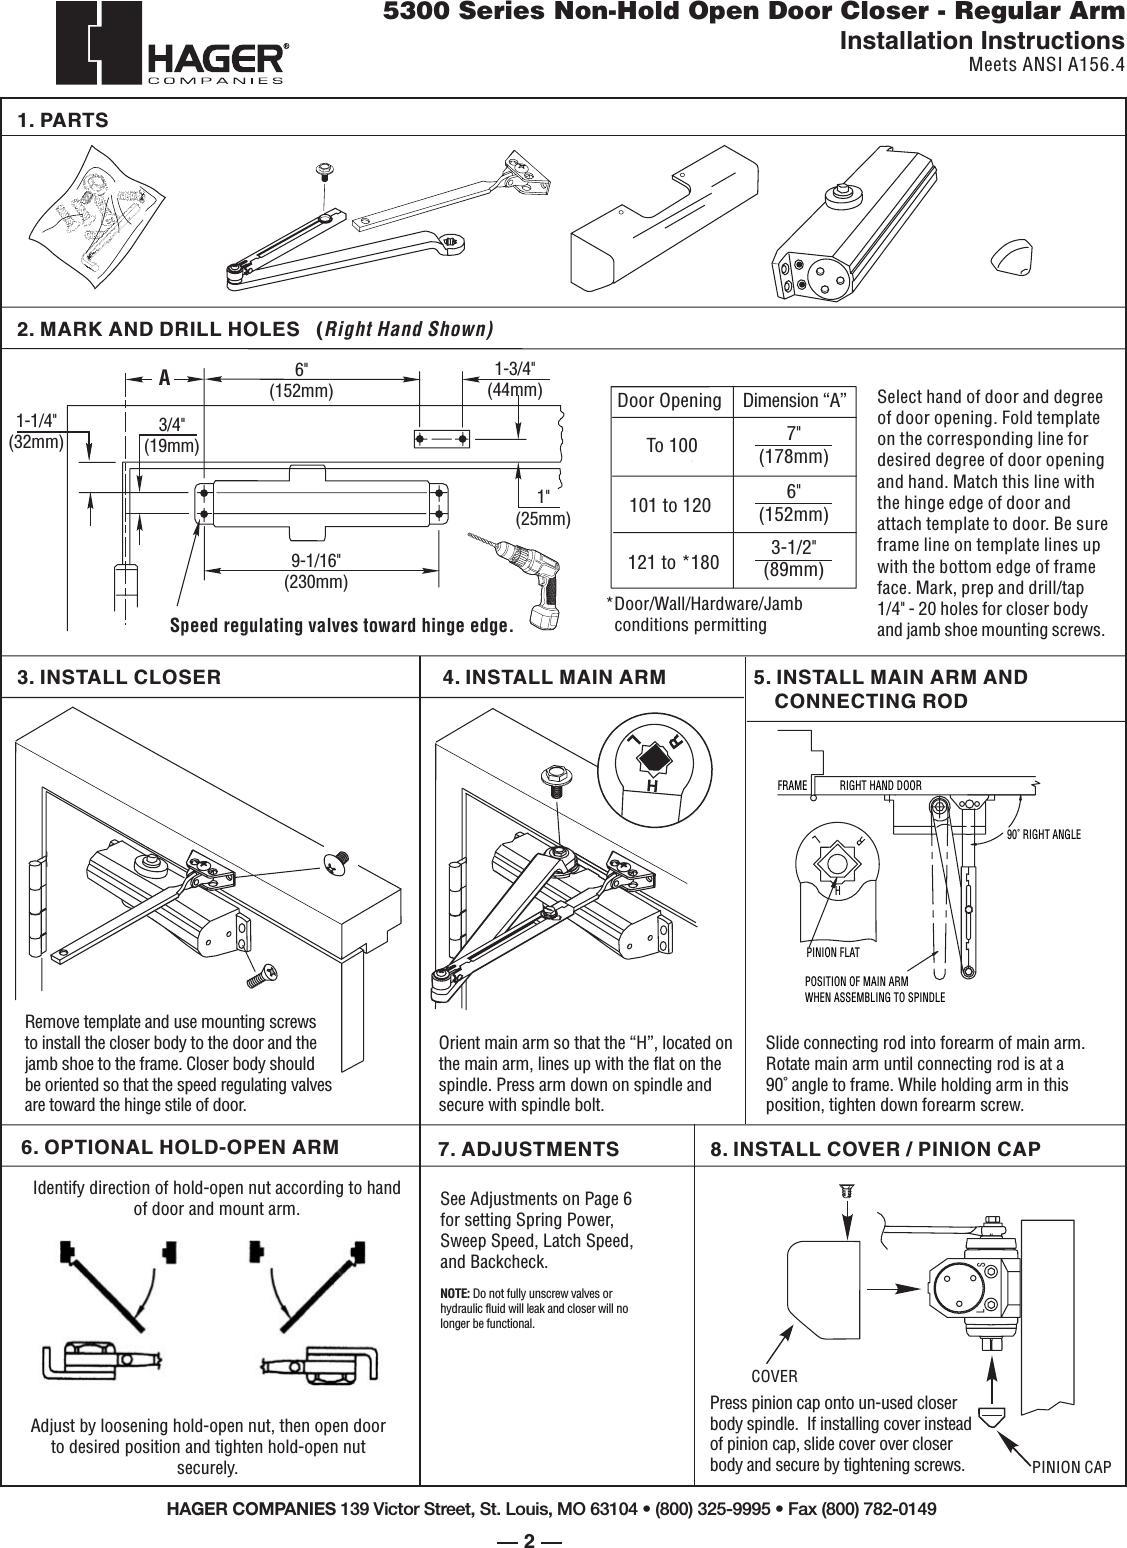 Door Closer Fs Manual Guide